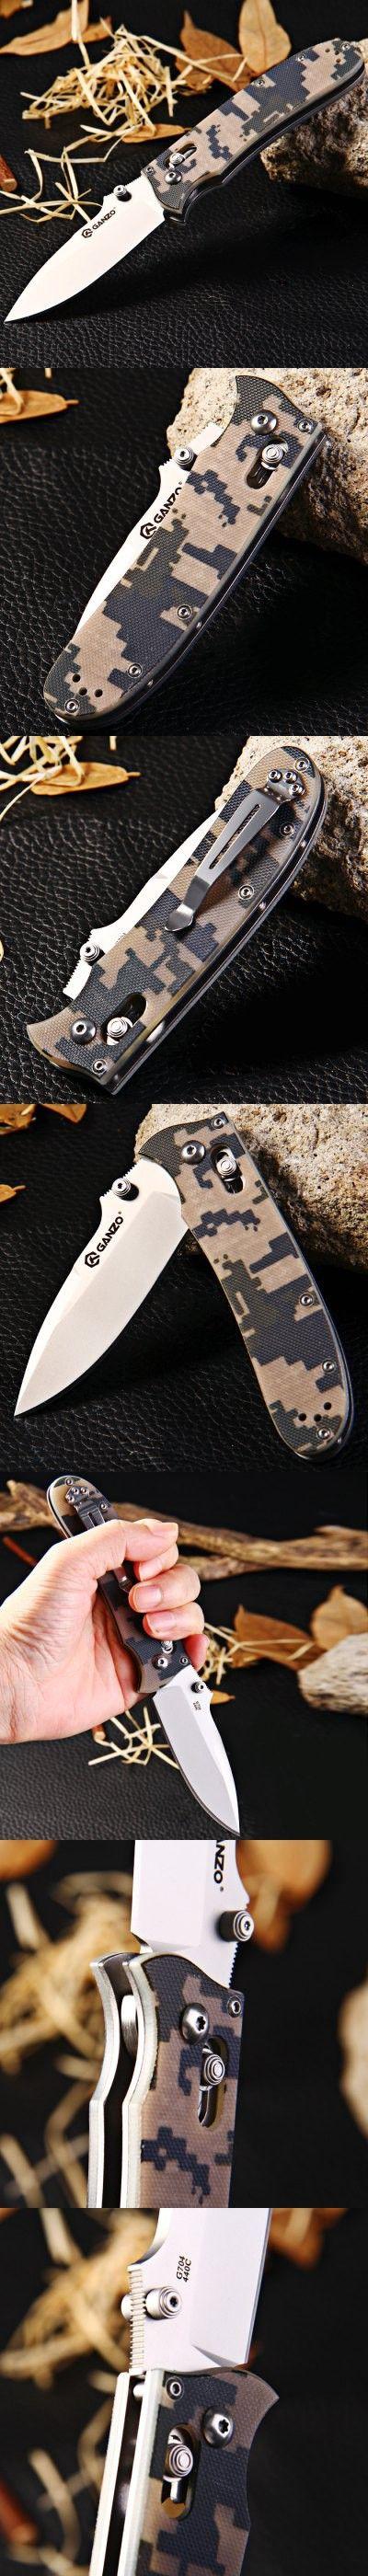 Pocket Knives and Folding Knives   Ganzo G704-CA Axis Lock Folding Knife